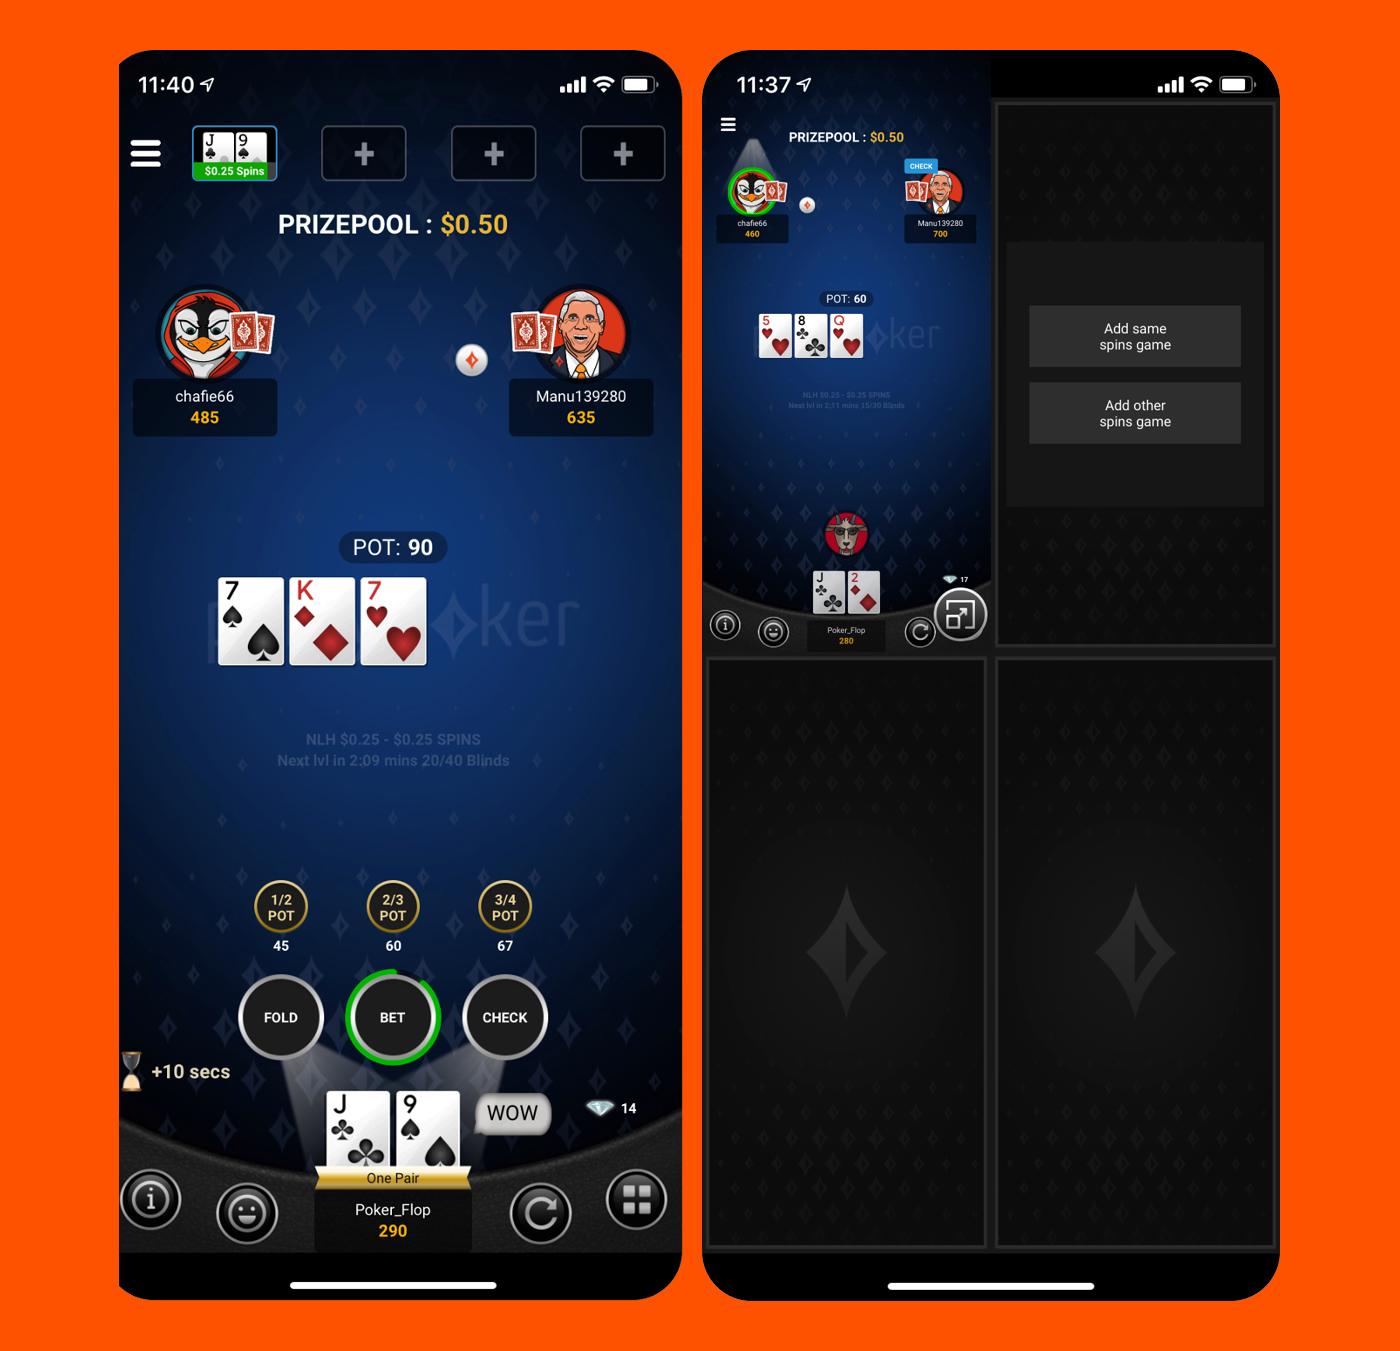 Portrait mode of Partypoker mobile app